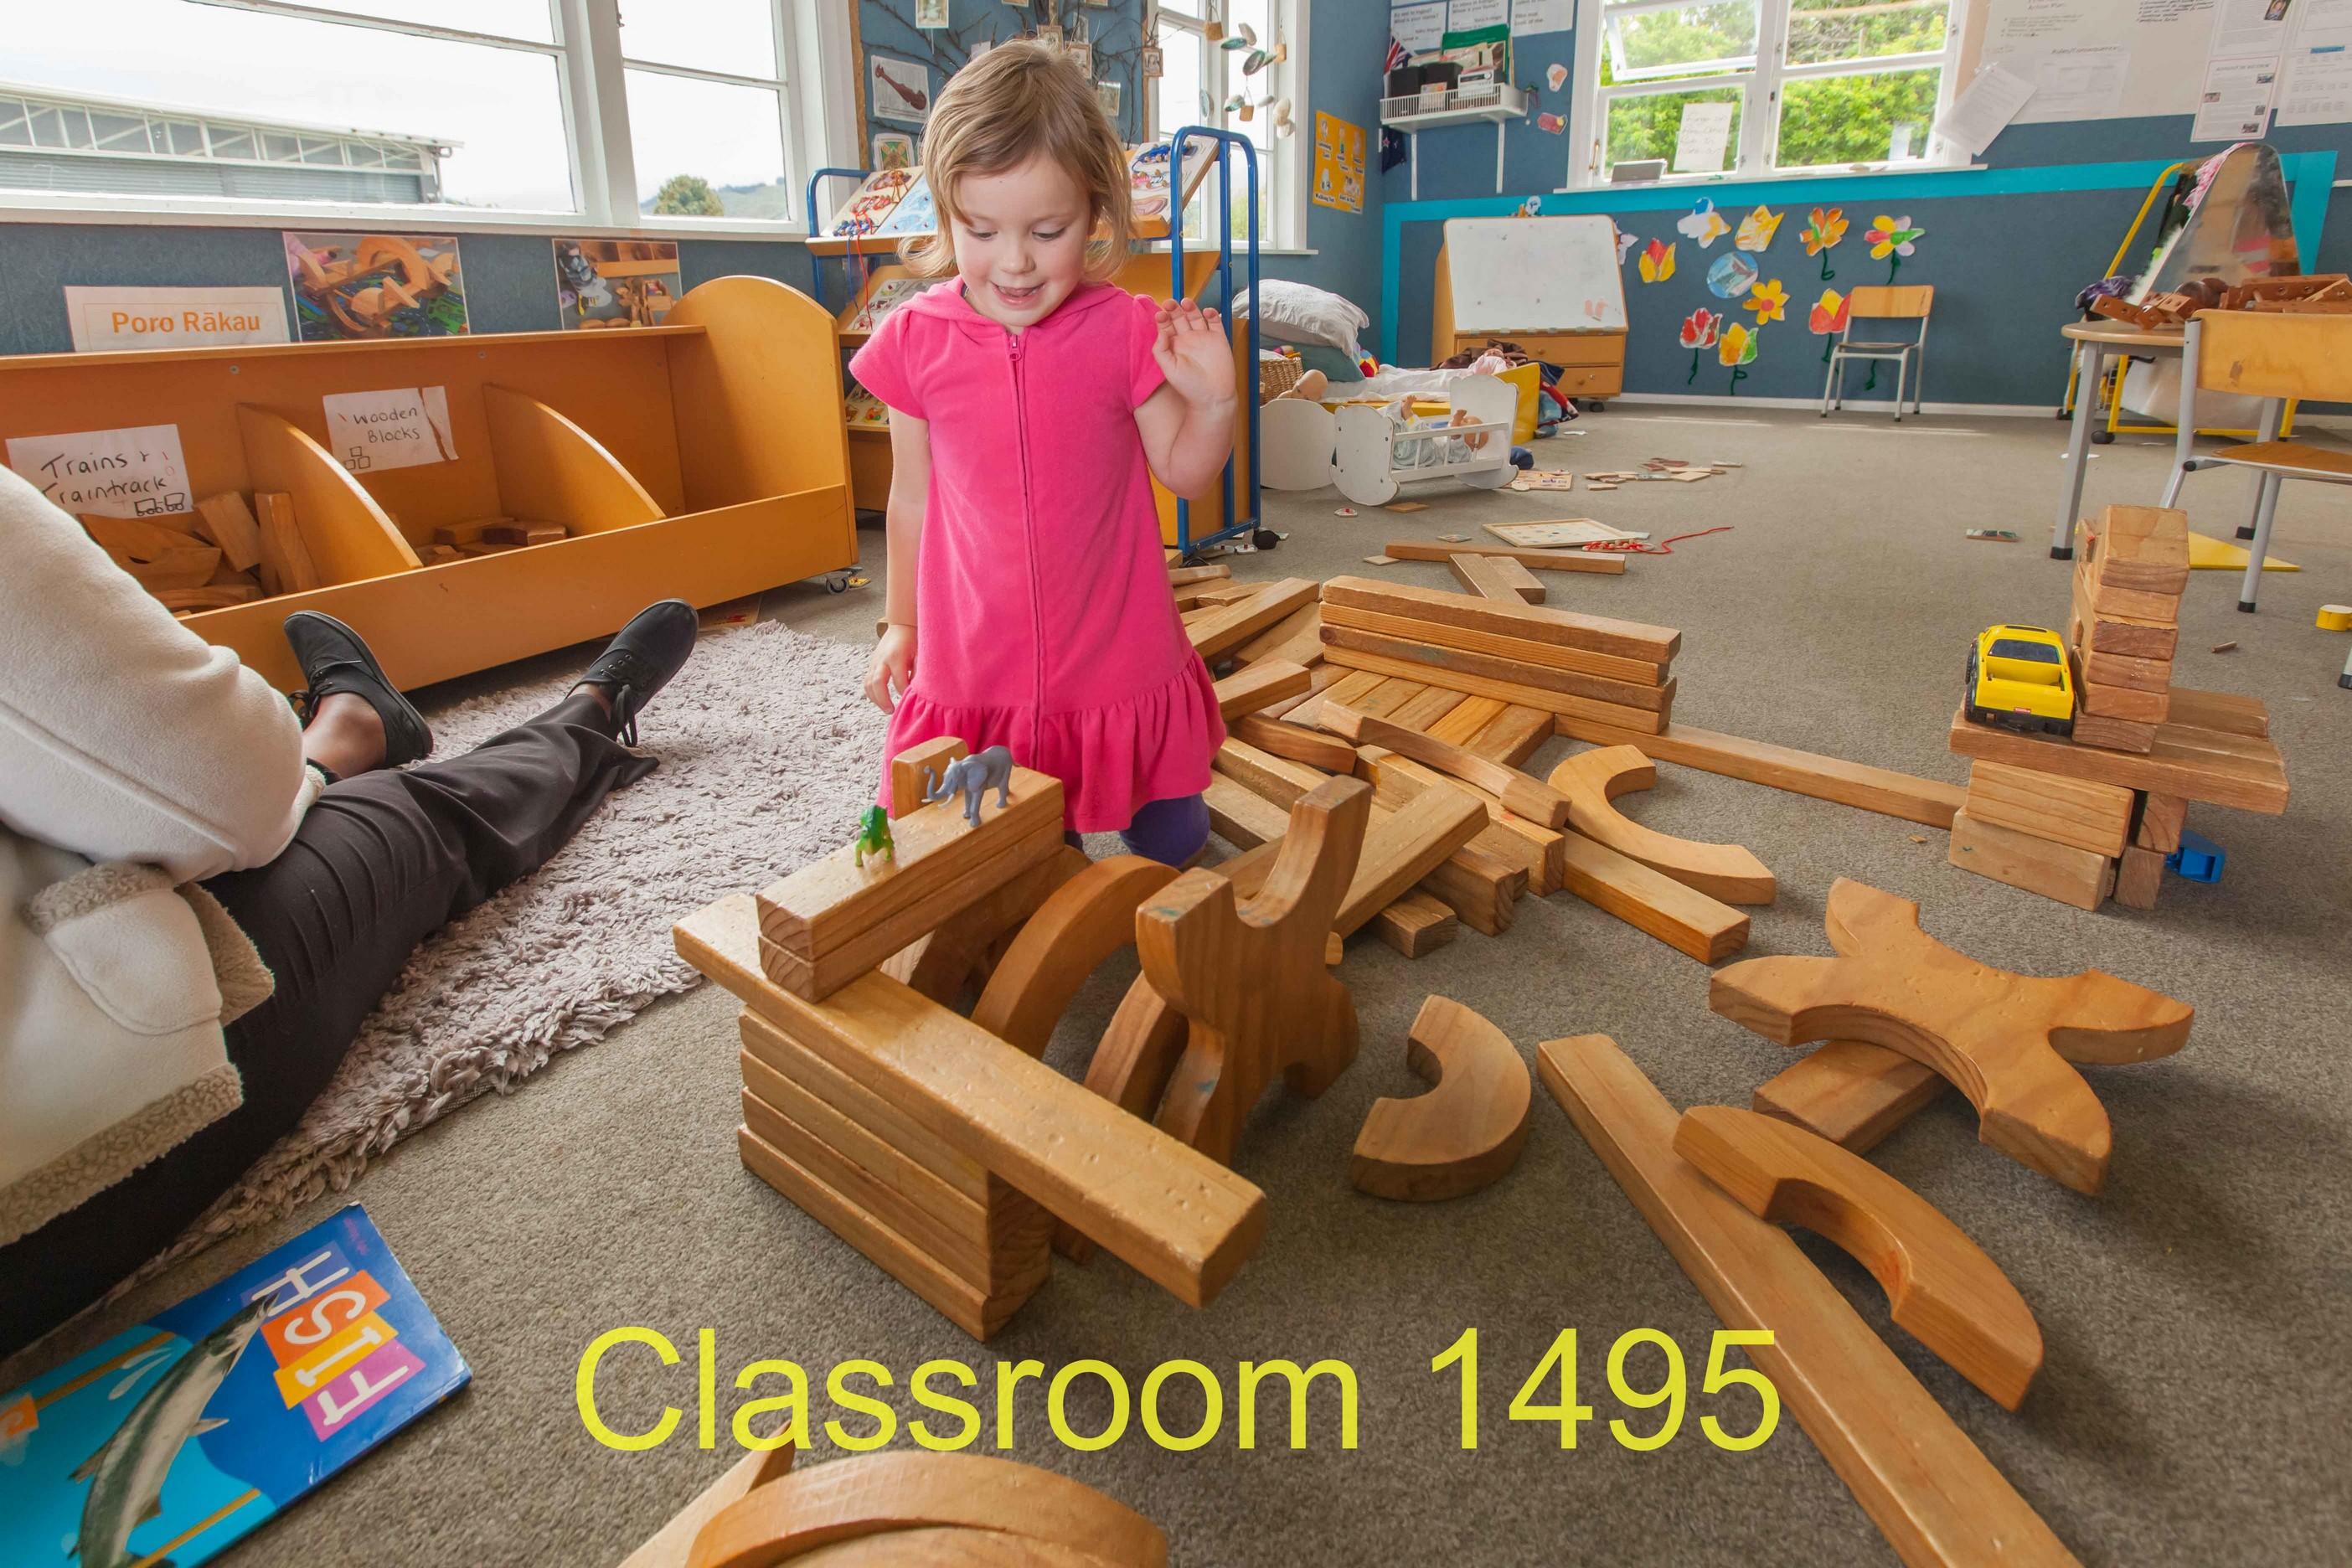 Classroom 1495